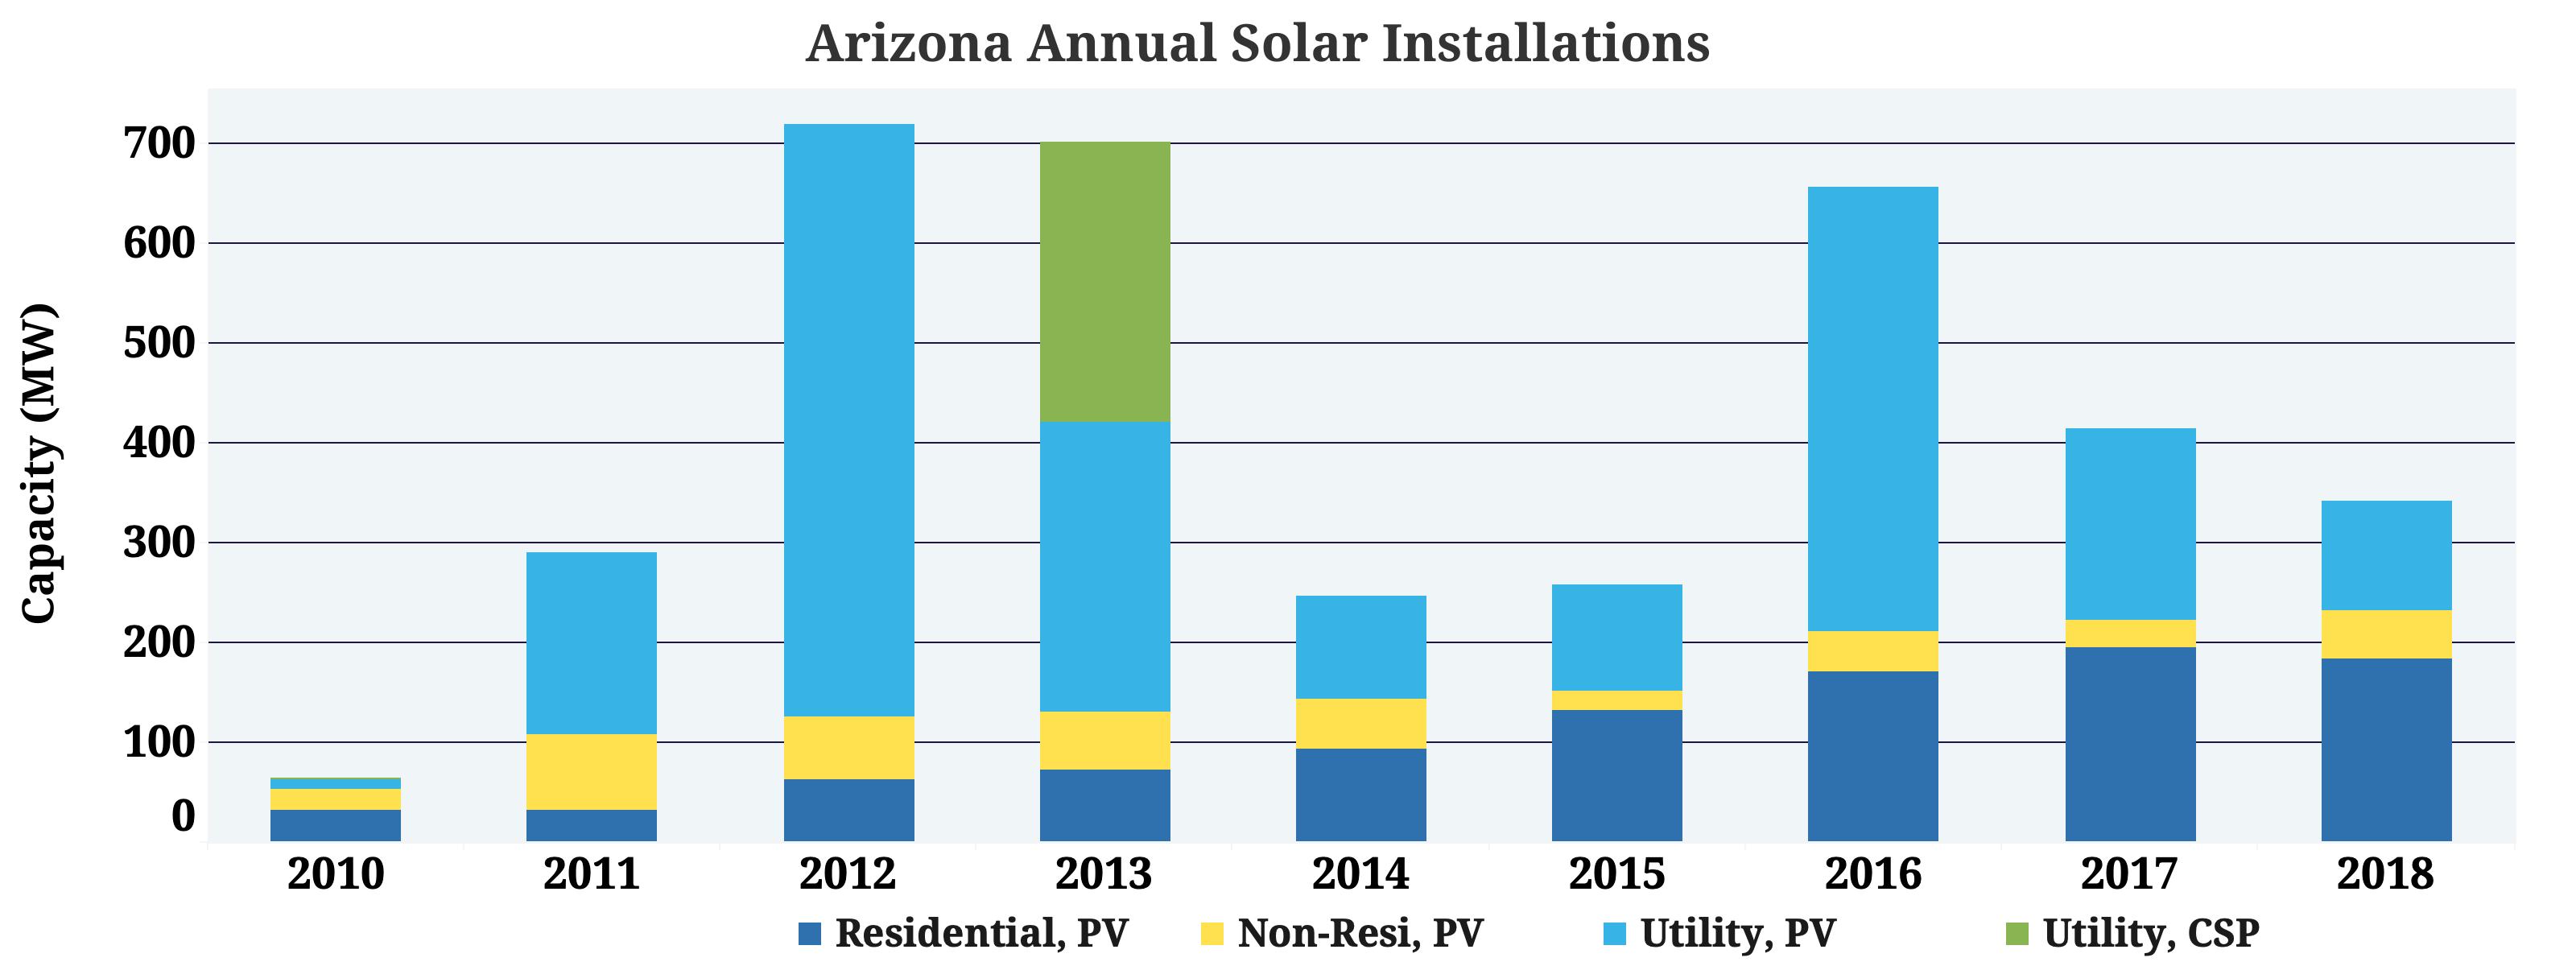 Arizona Get More Solar Industry Data